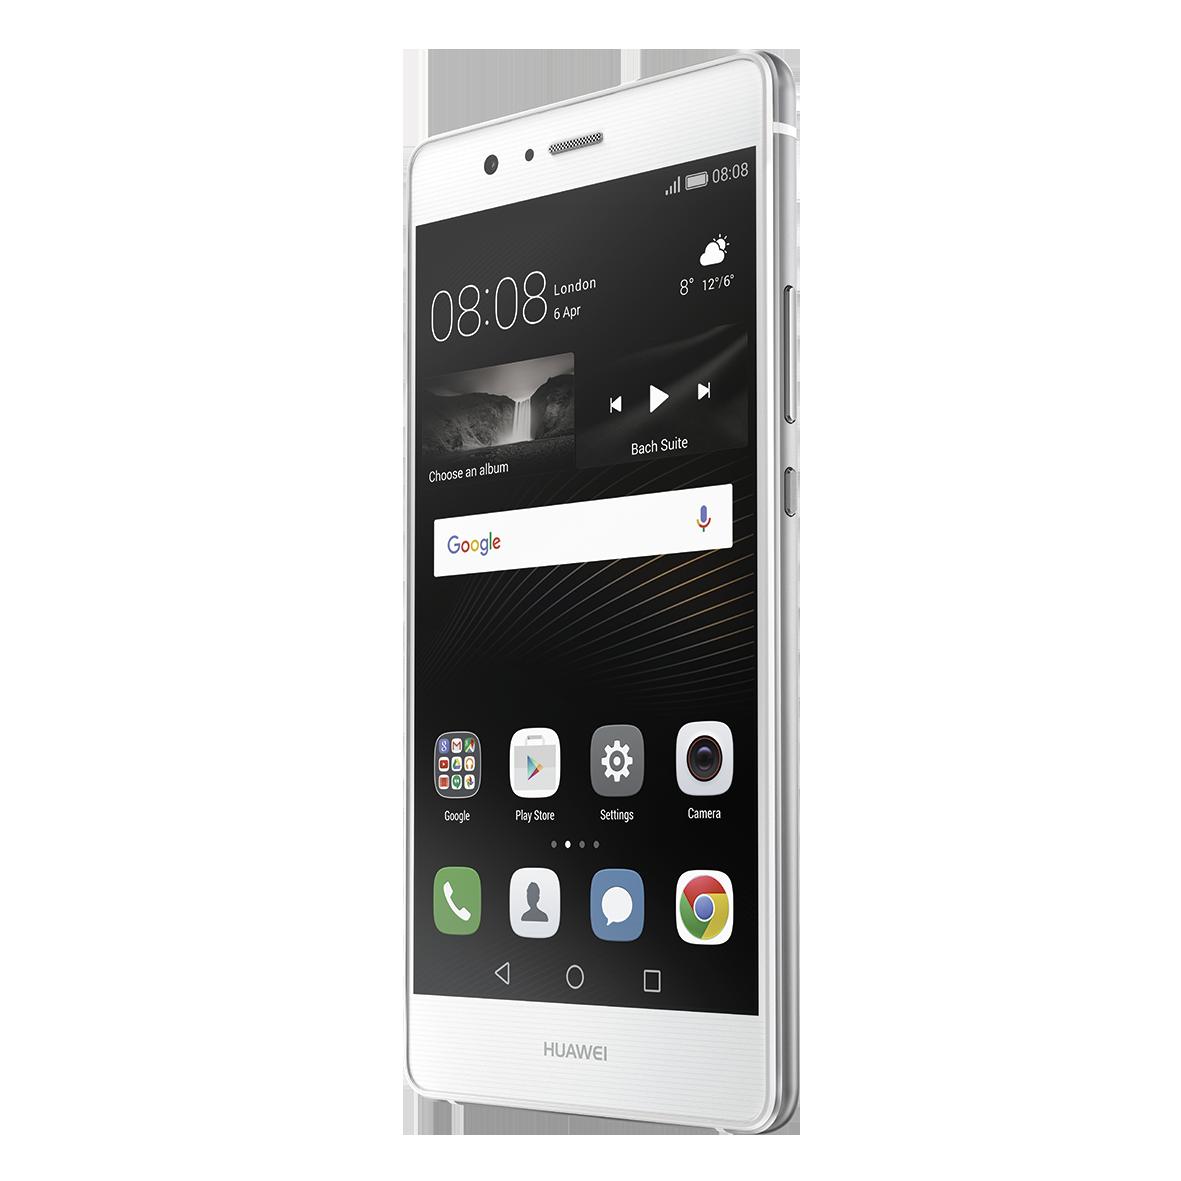 Huawei-P9-Lite-White